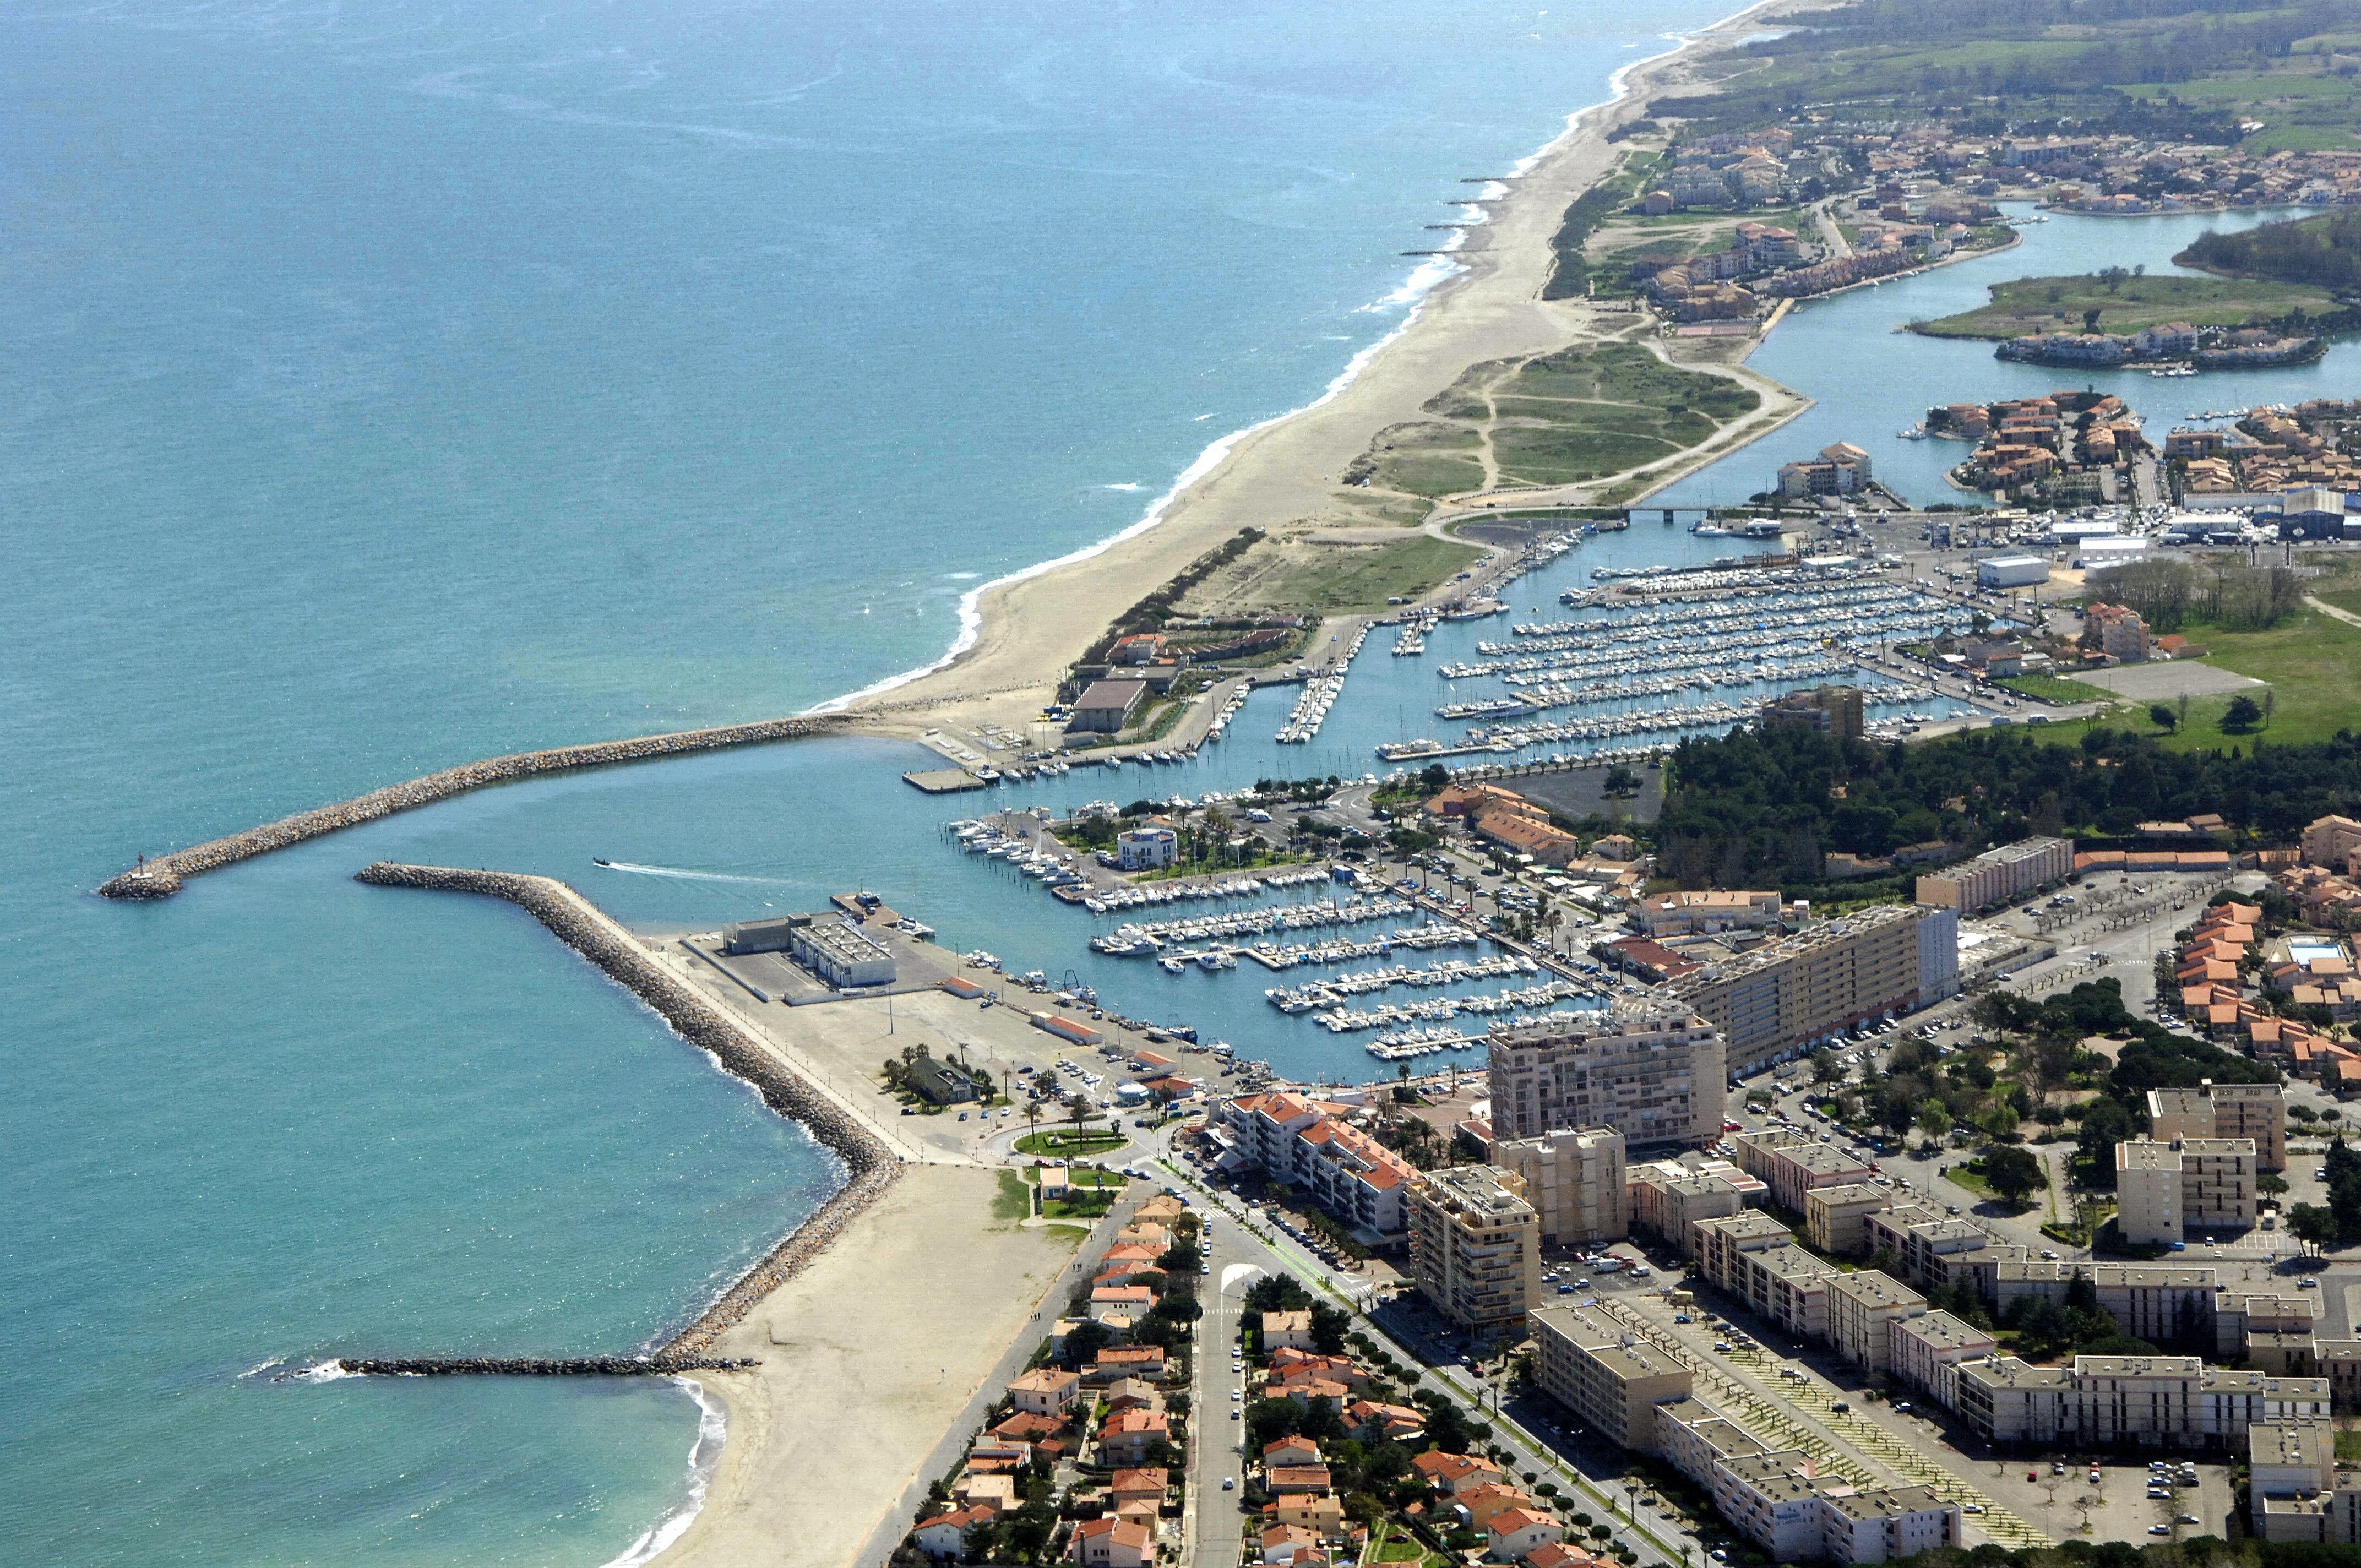 St Cyprien Marina in Saint Cyprien, France - Marina Reviews - Phone